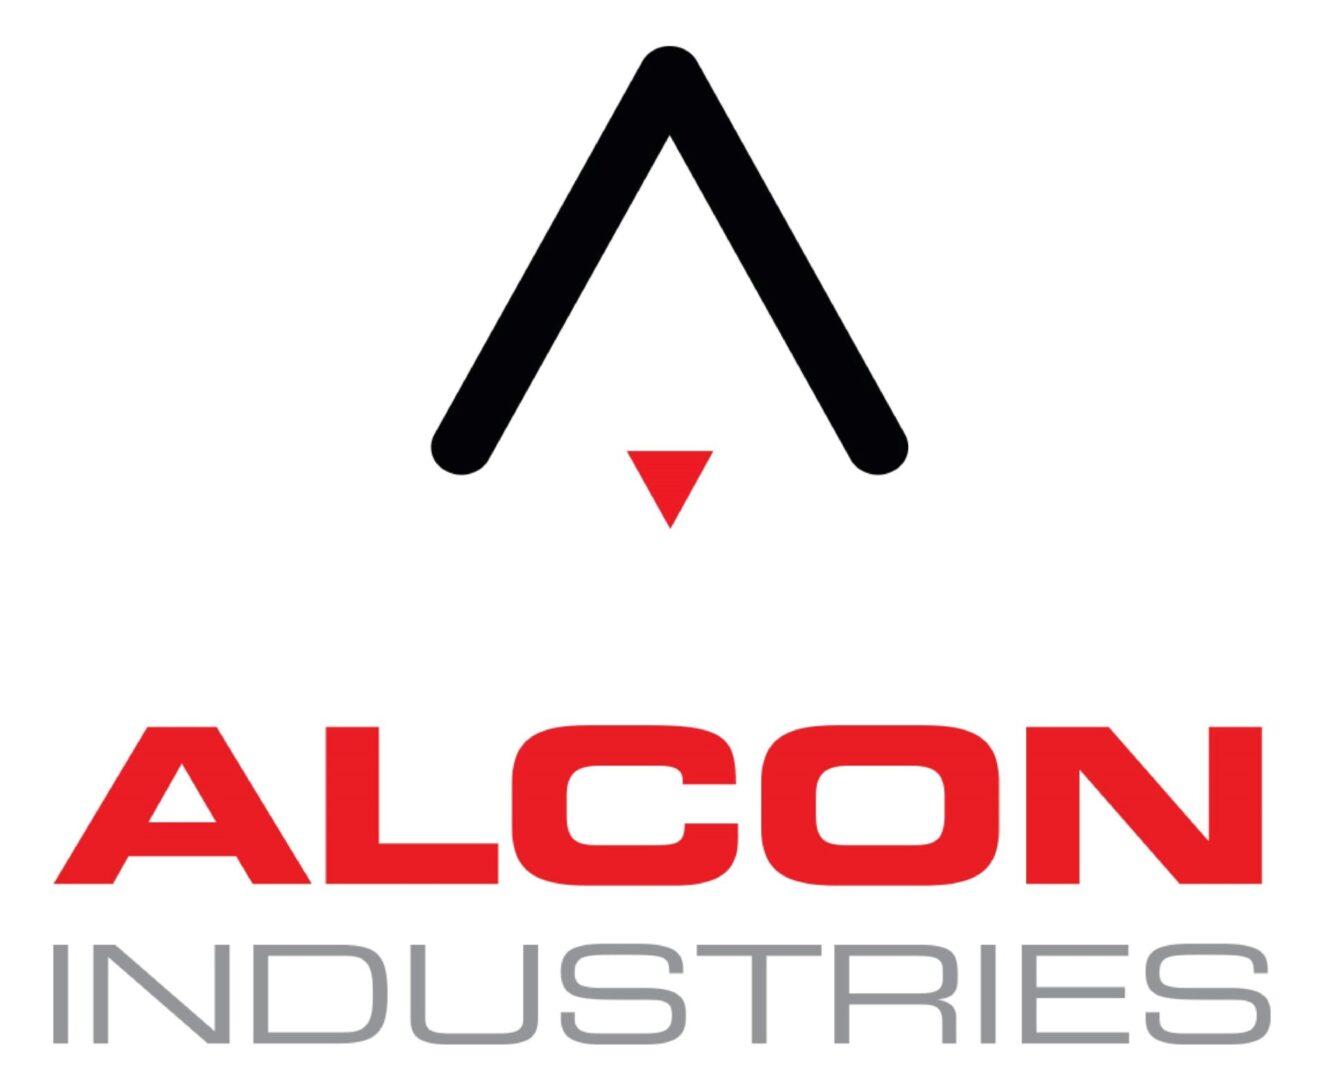 ALCON INDUSTRIES